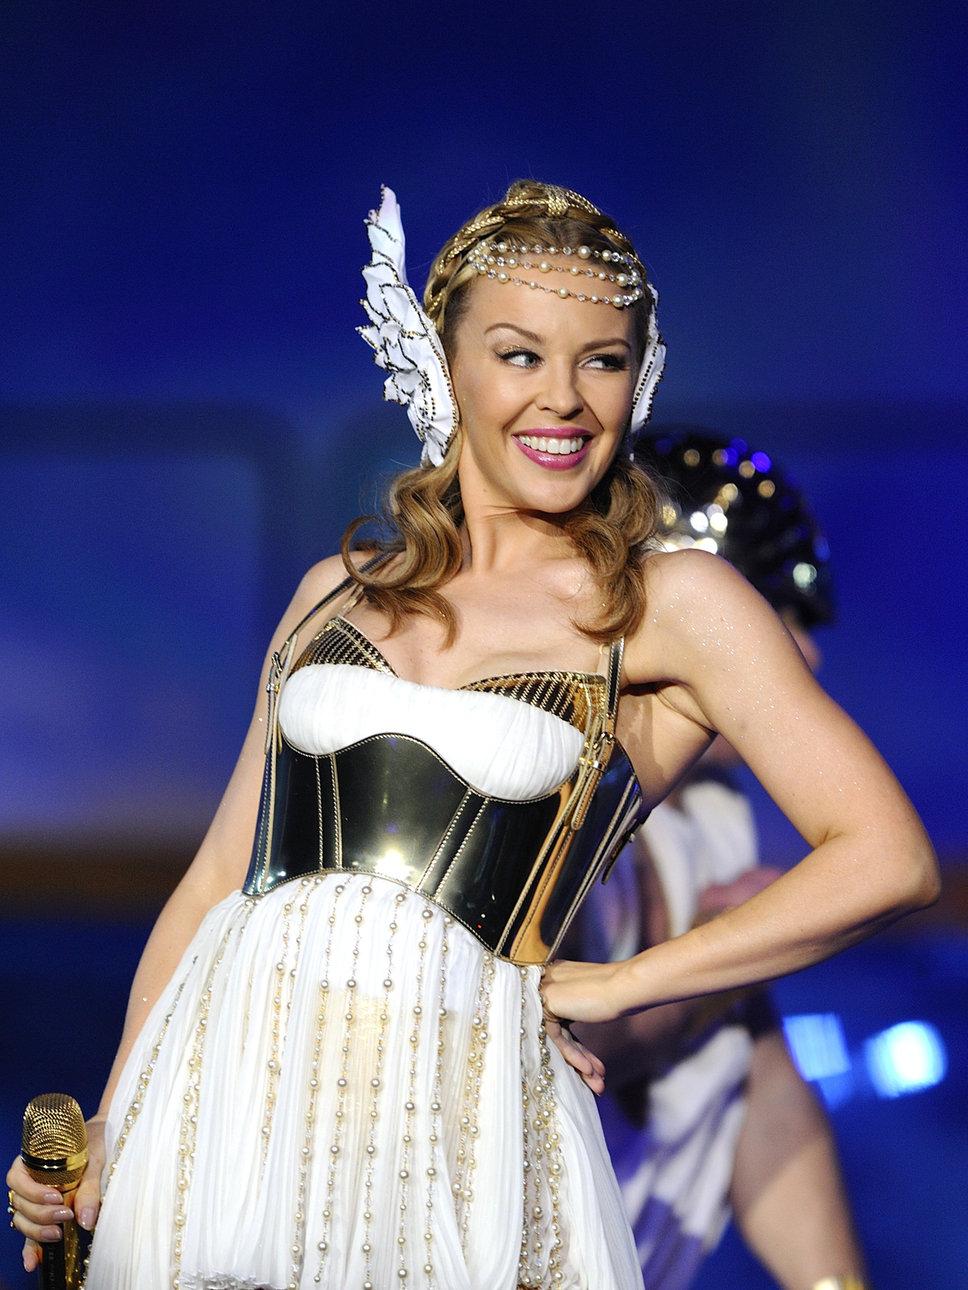 Mariah carey alicia keys amp tyra banks naked in hd - 4 1